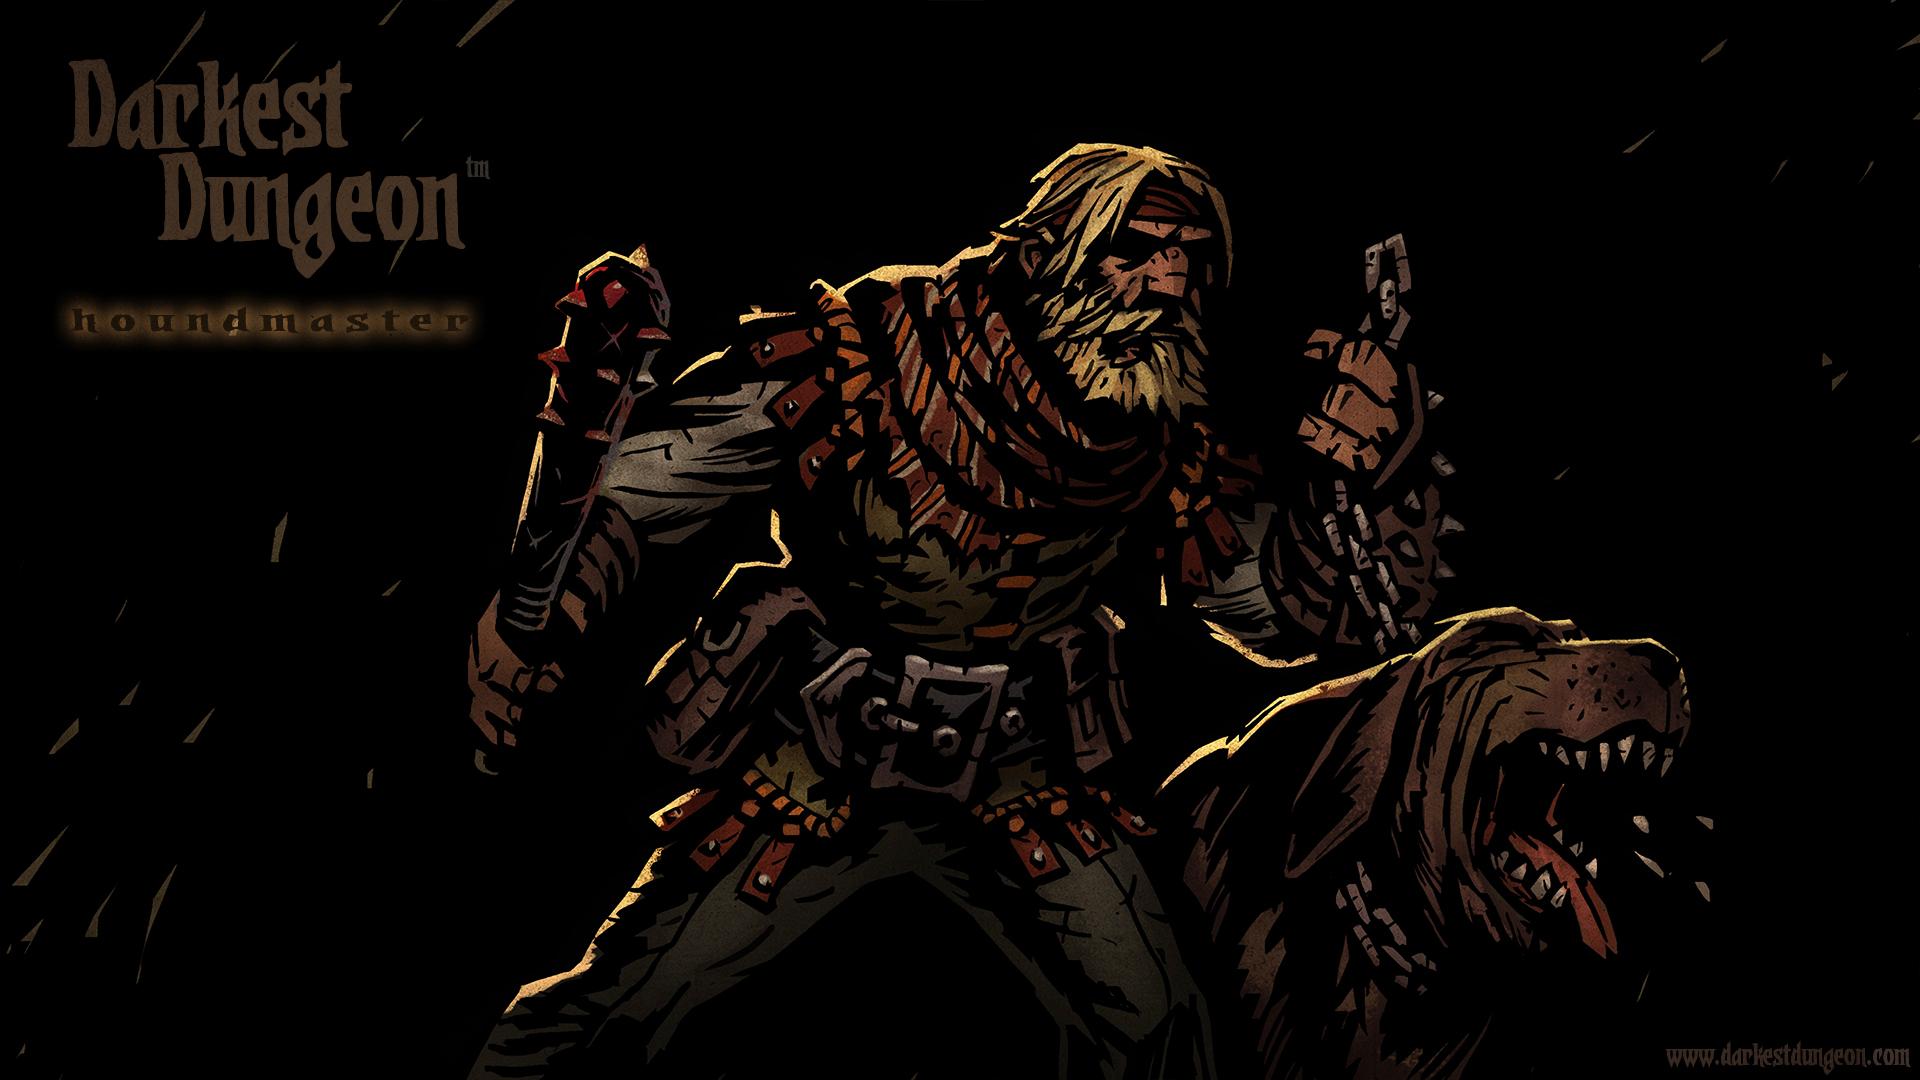 27 Darkest Dungeon HD Wallpapers   Backgrounds - Wallpaper ...